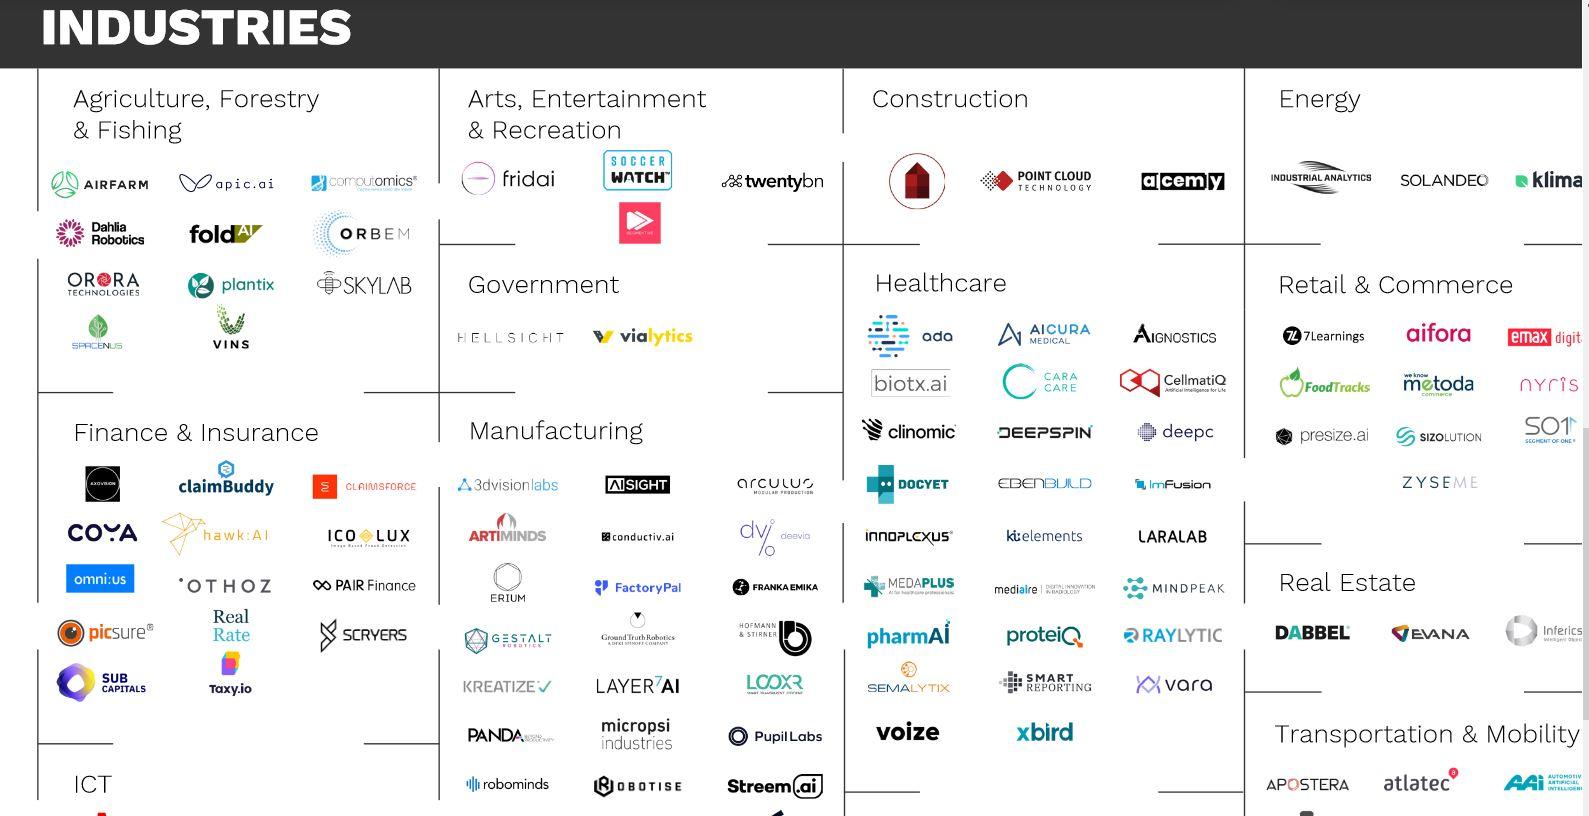 ArtiMinds Robotics selected for 2021 German AI Startup Landscape